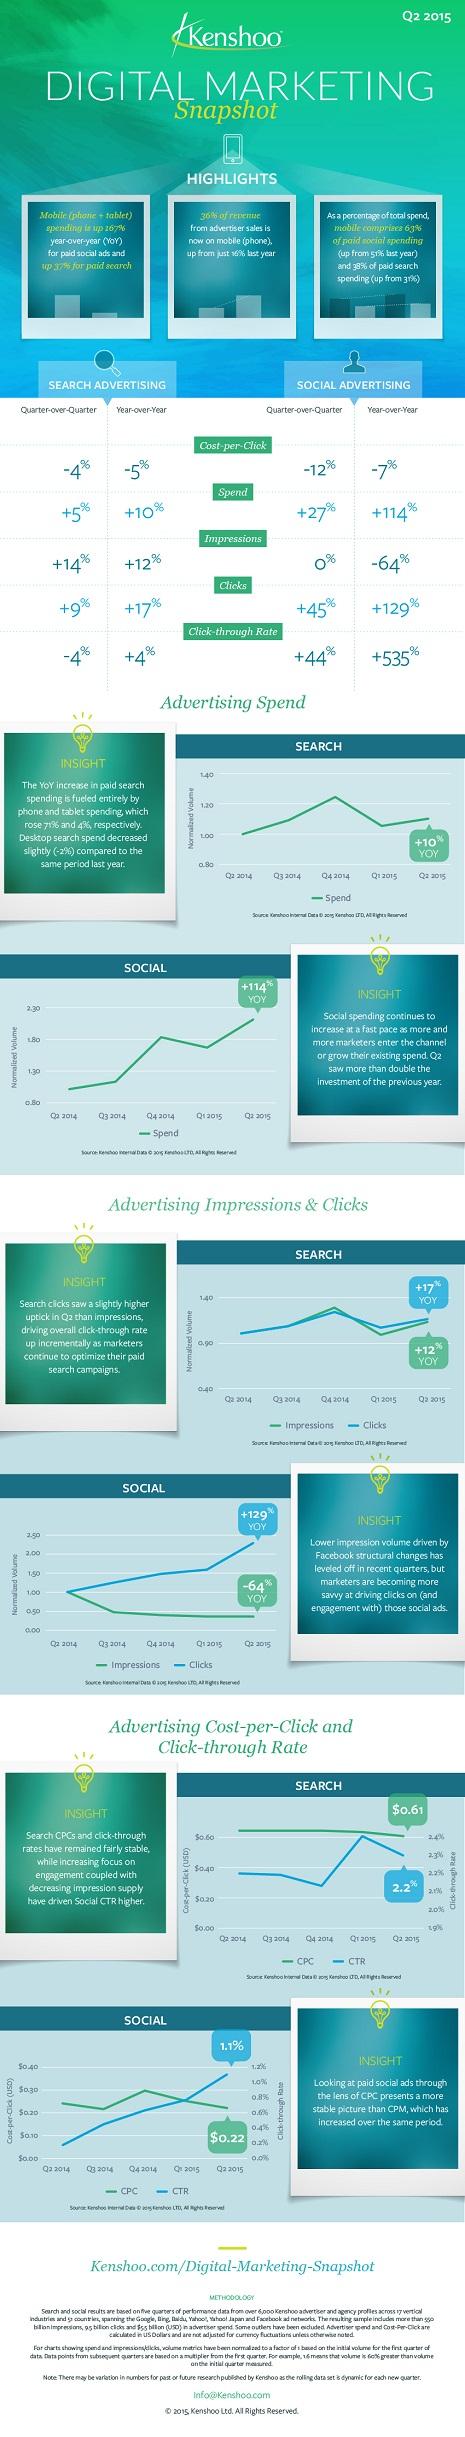 Global-Ad-Trends-Q2-2015 pq